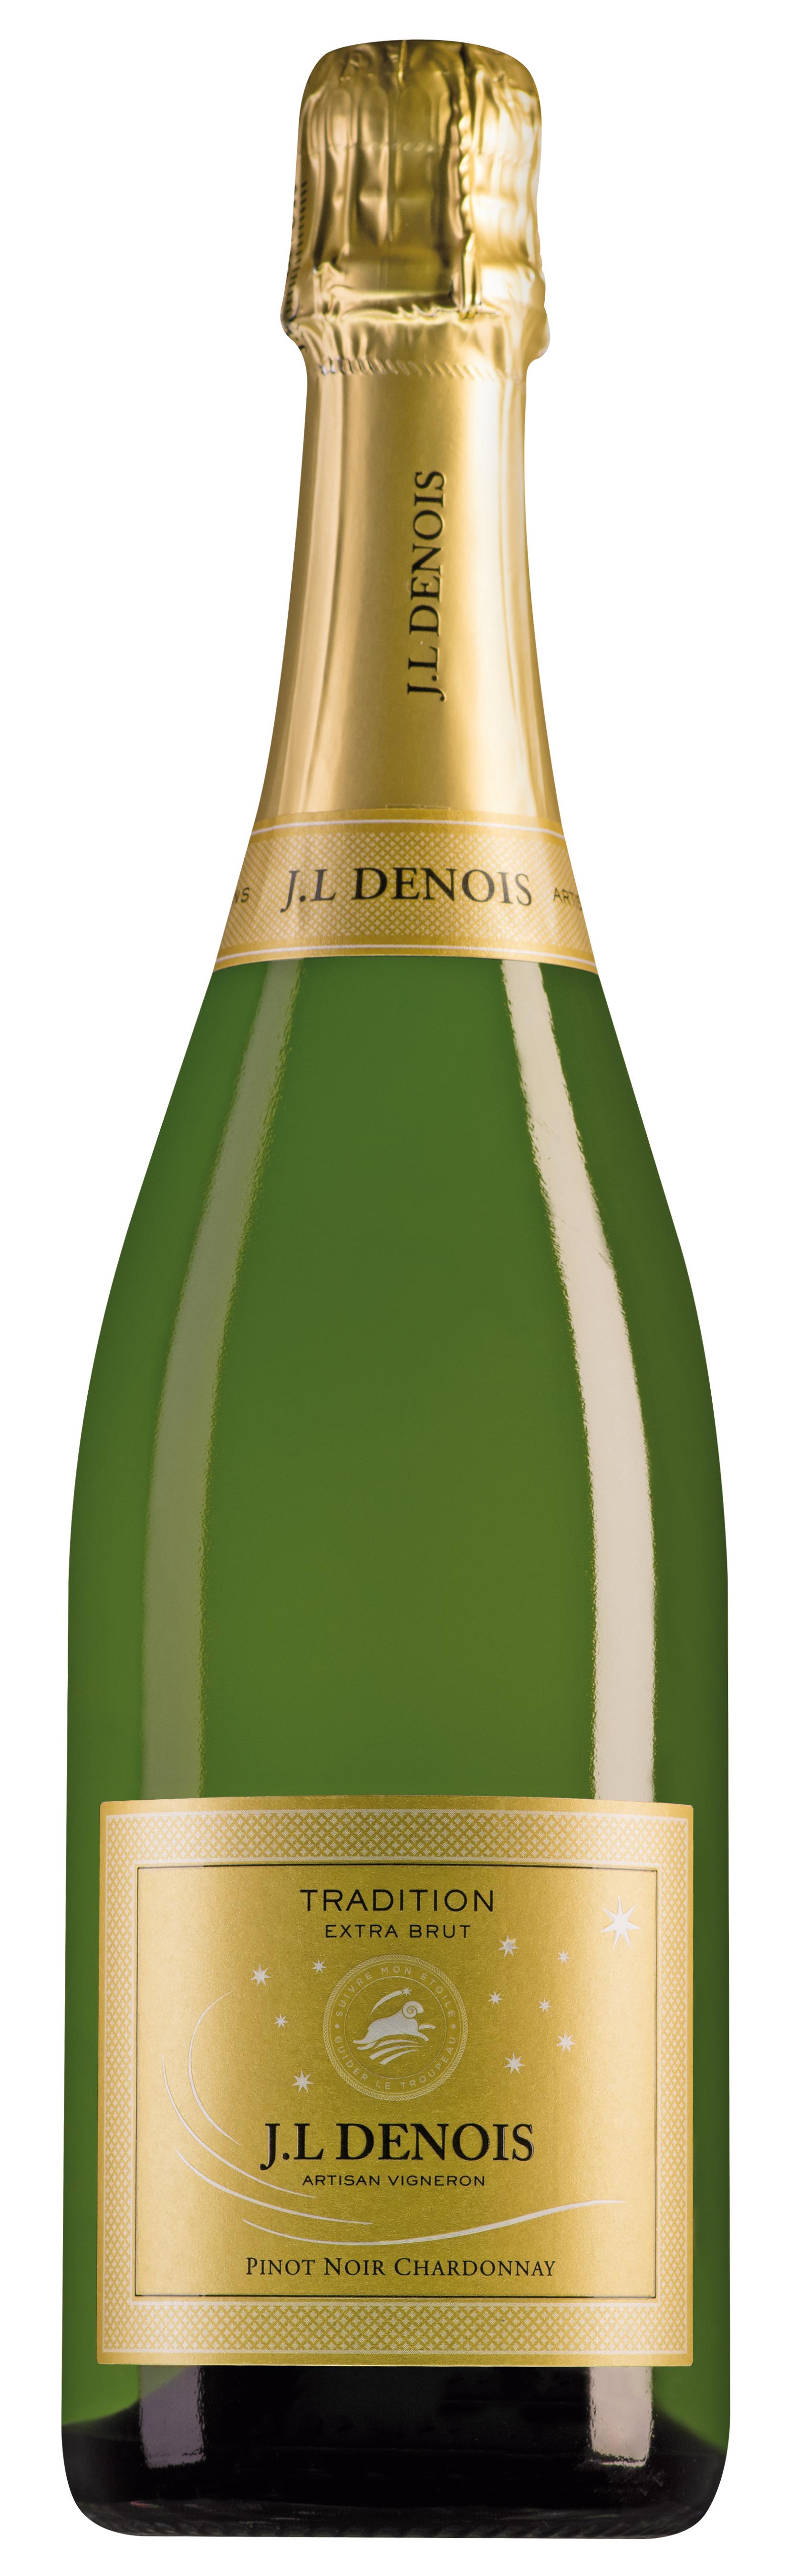 Jean-Louis Denois Chardonnay-Pinot Noir Tradition Extra Brut